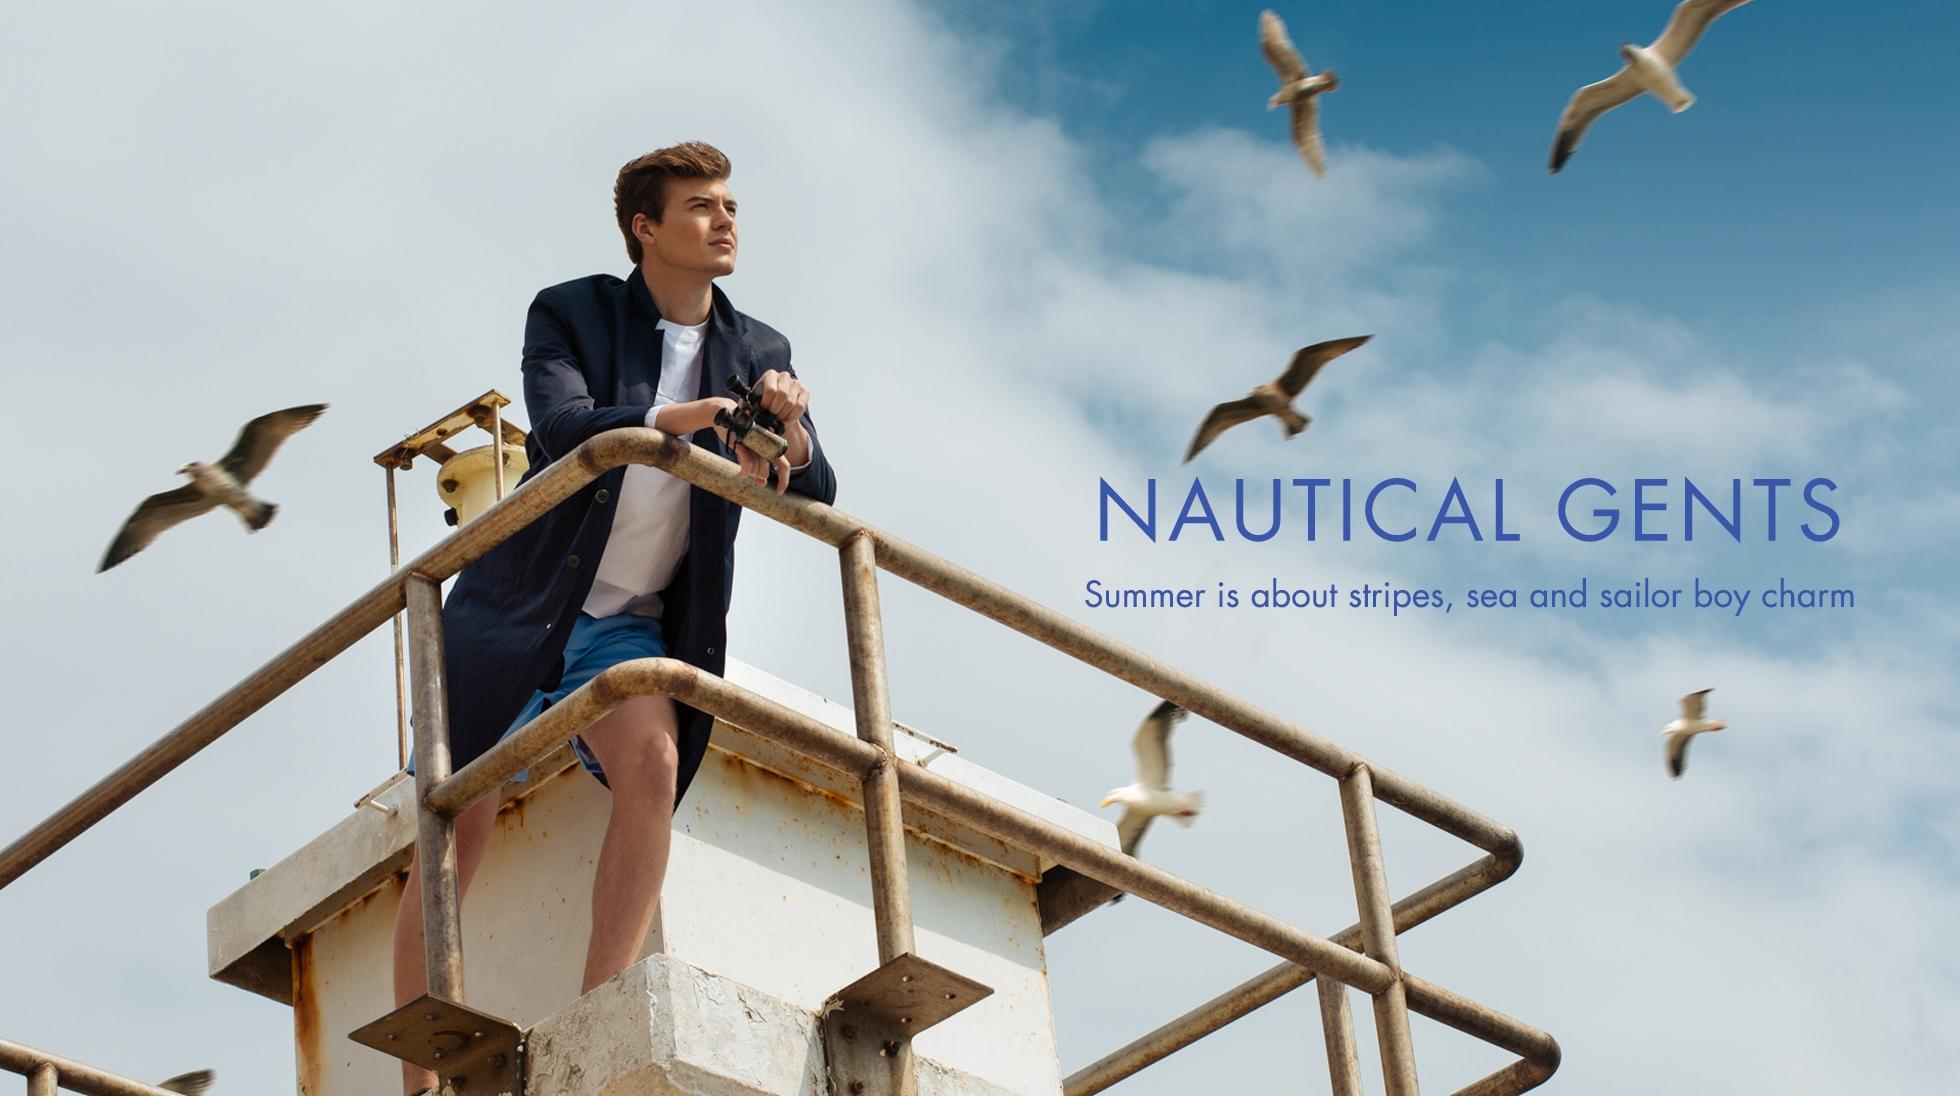 Nautical Gents